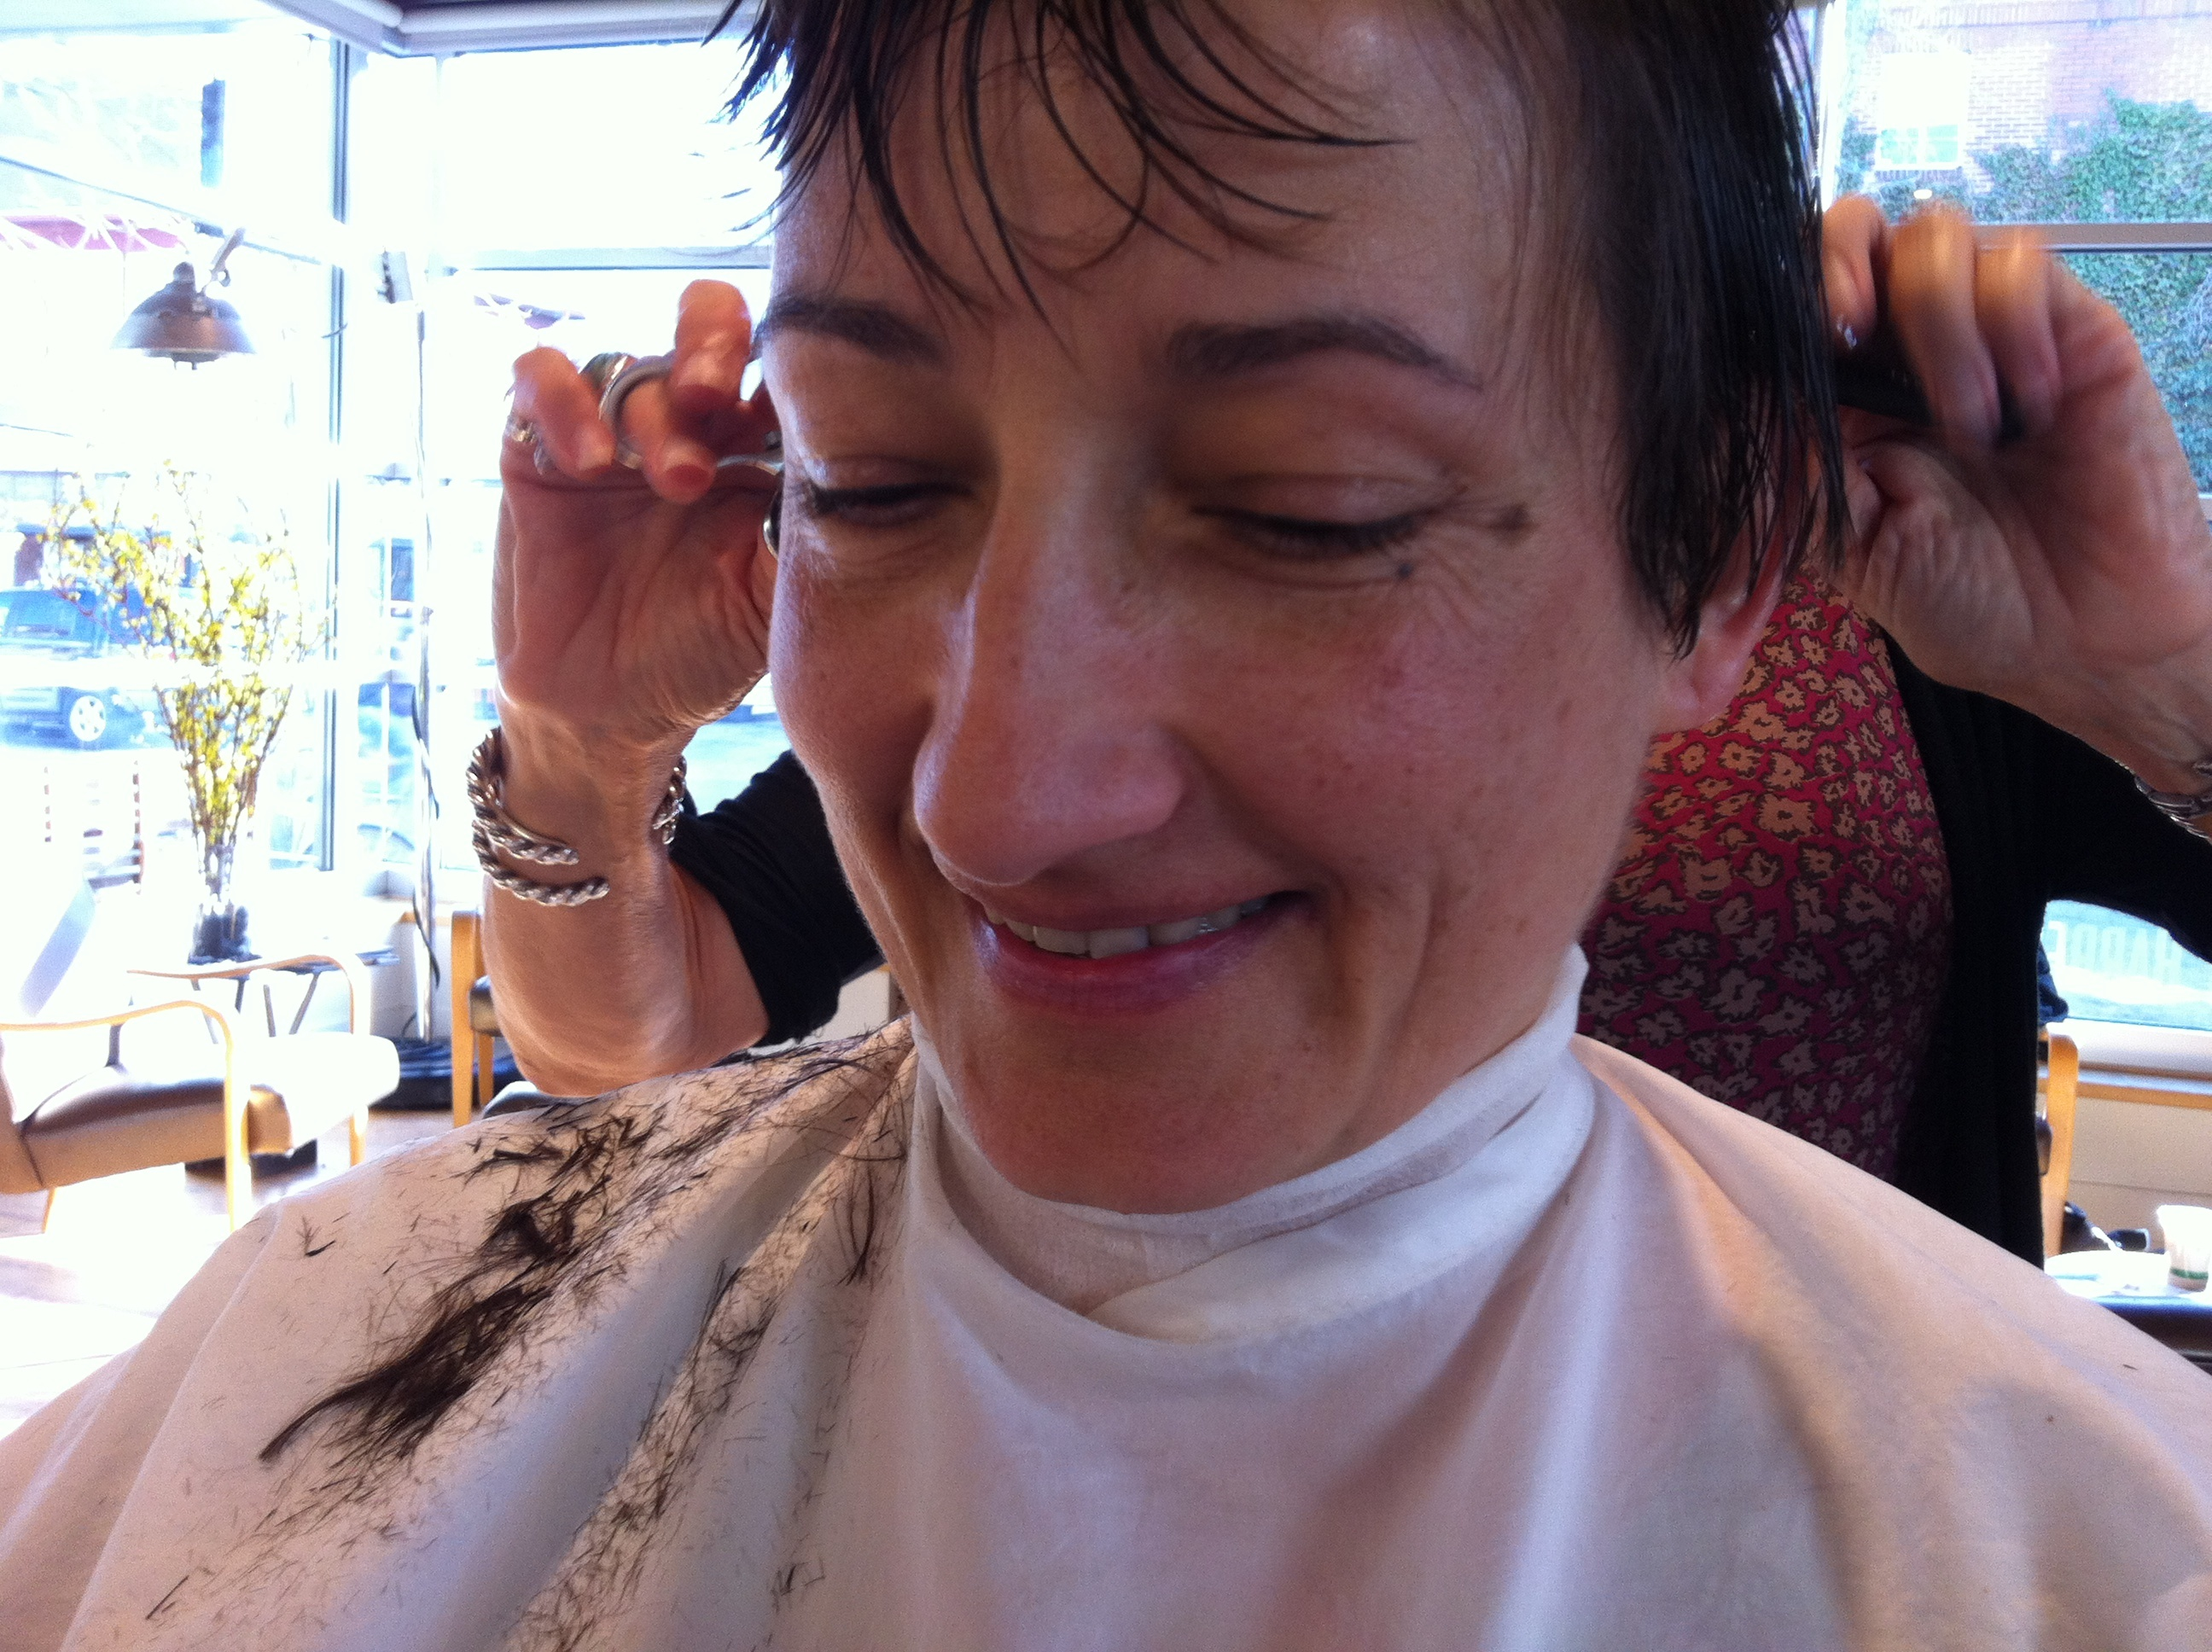 Barber Shop Names Barber Shop Woman Barber Shop Haircuts Women Haircut ...